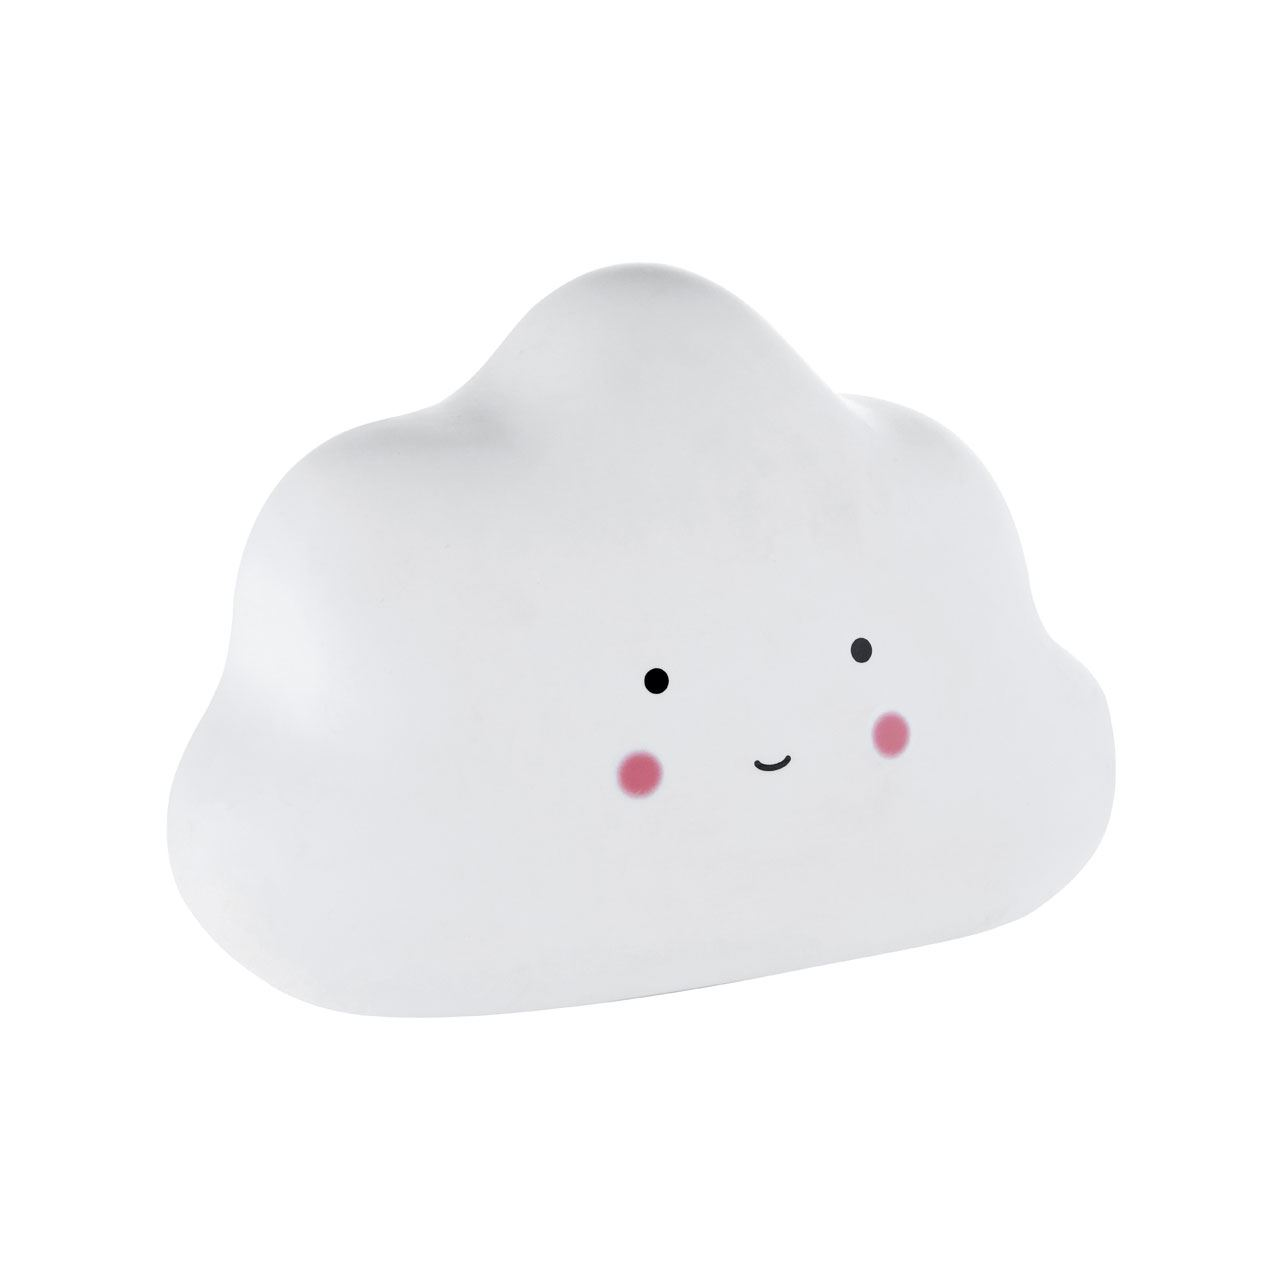 Kids Cloud Night Light, White Ceramic, In-Line Switch